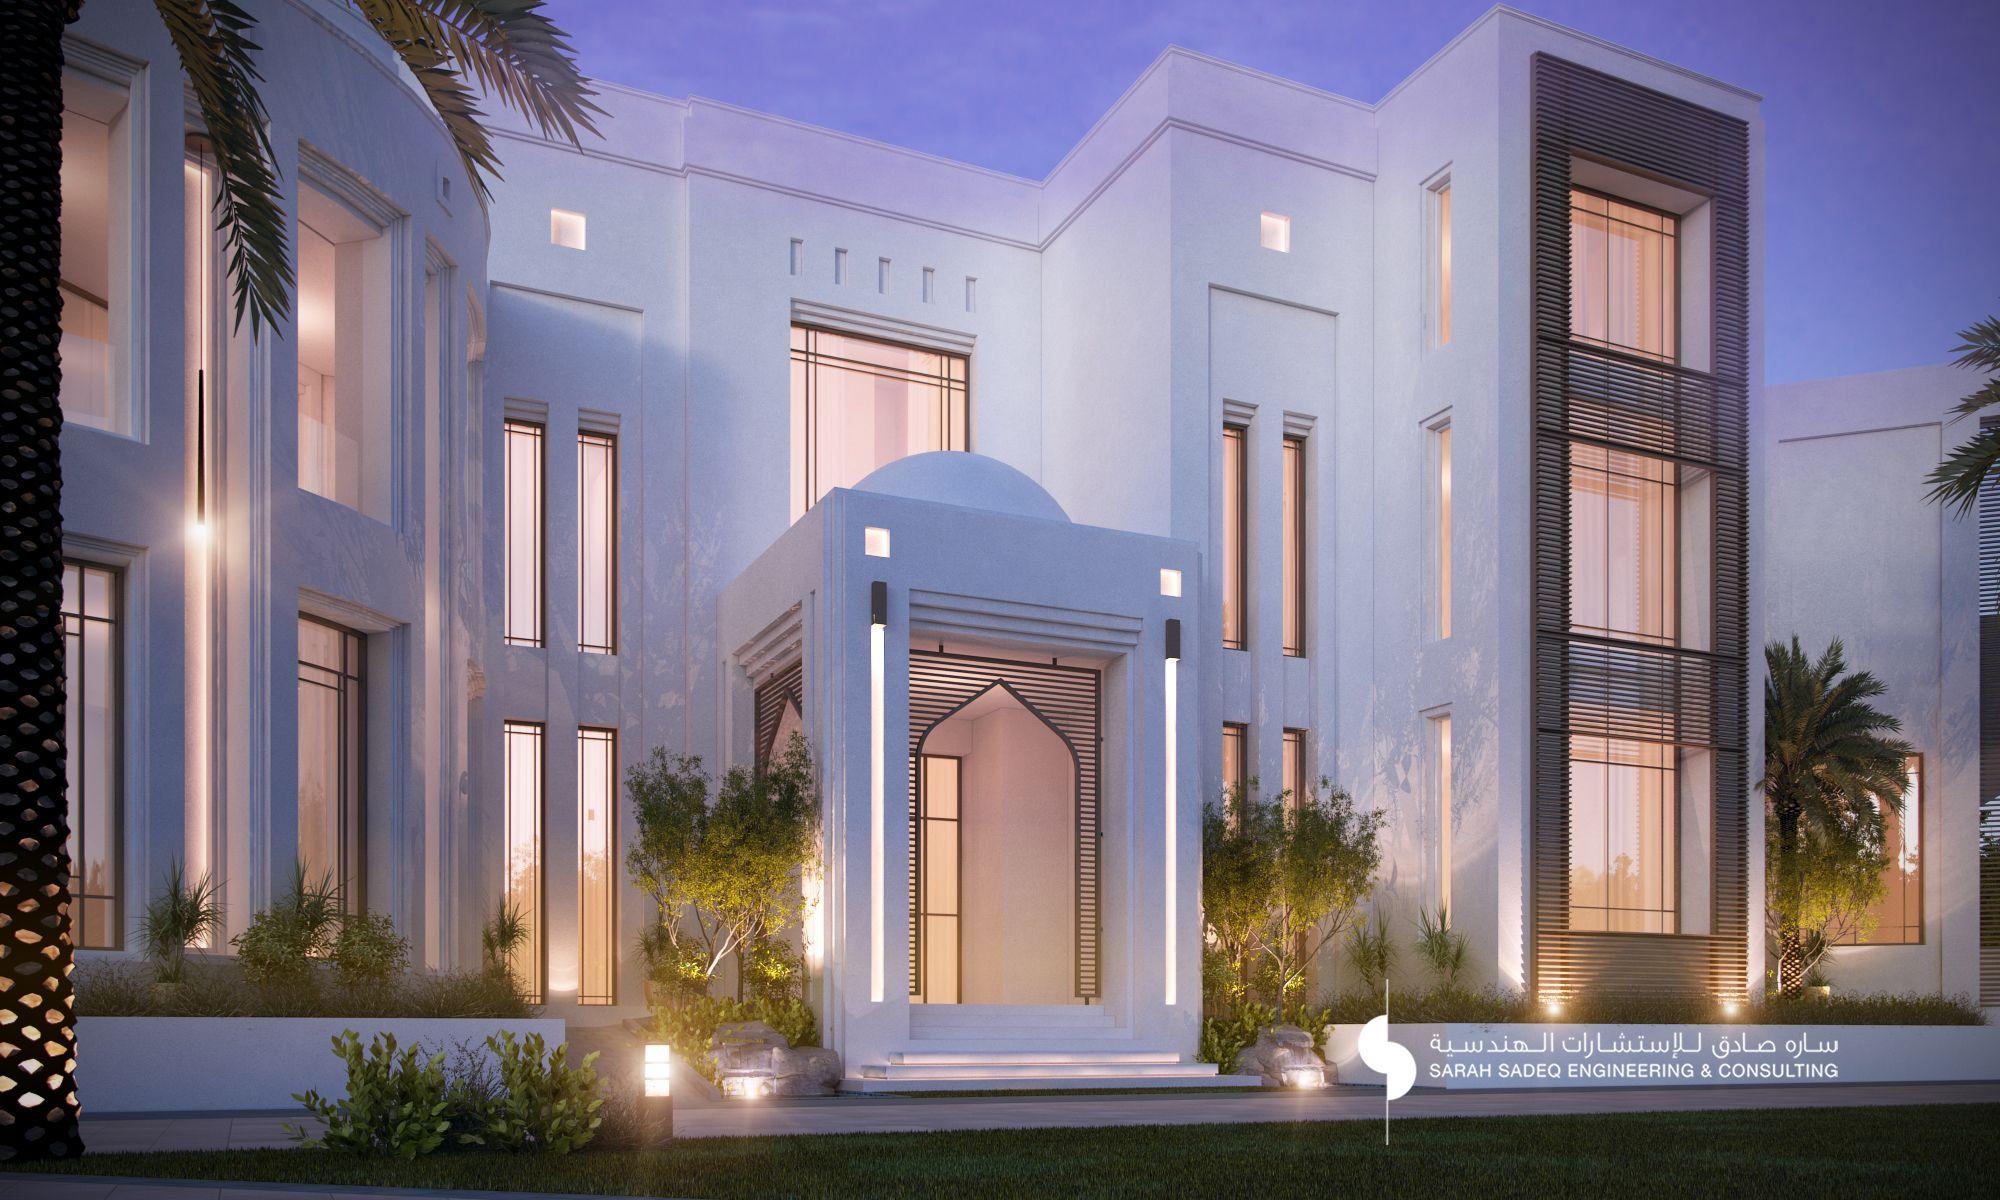 fp villa exterior design dubai beautiful houses